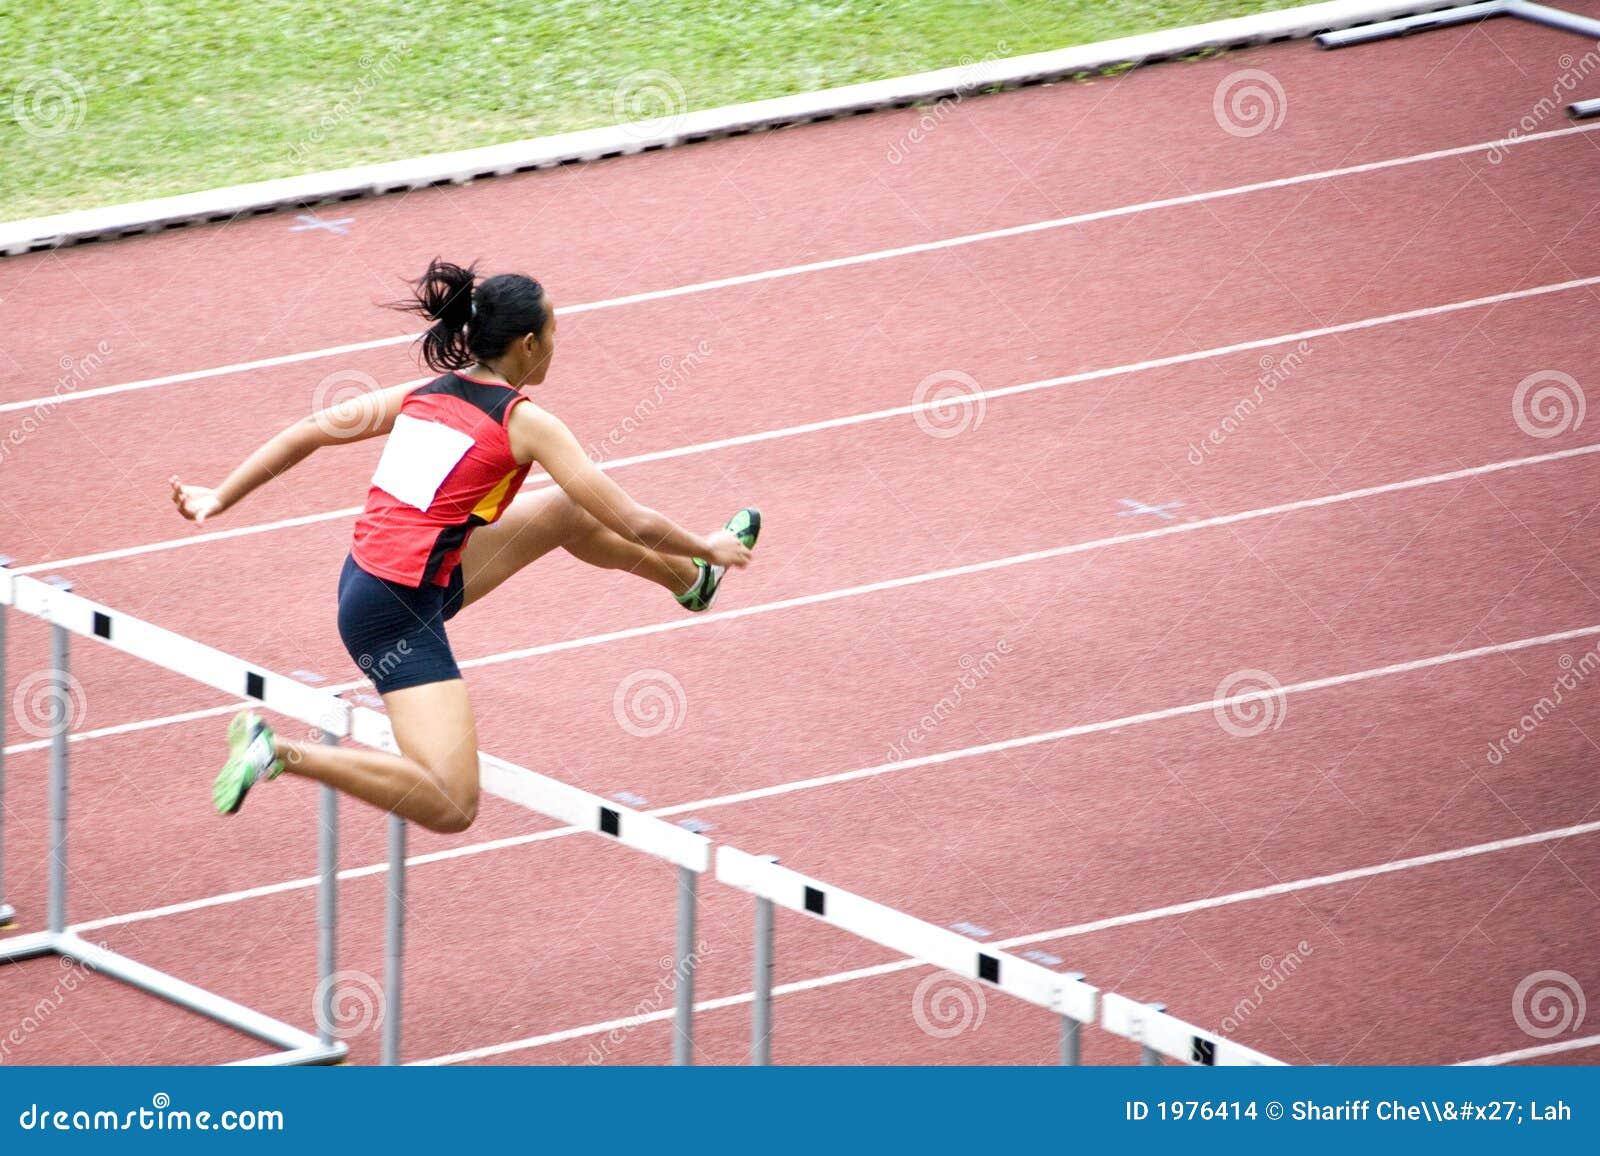 Women's 100m Hurdles Stock Images - Image: 1976414